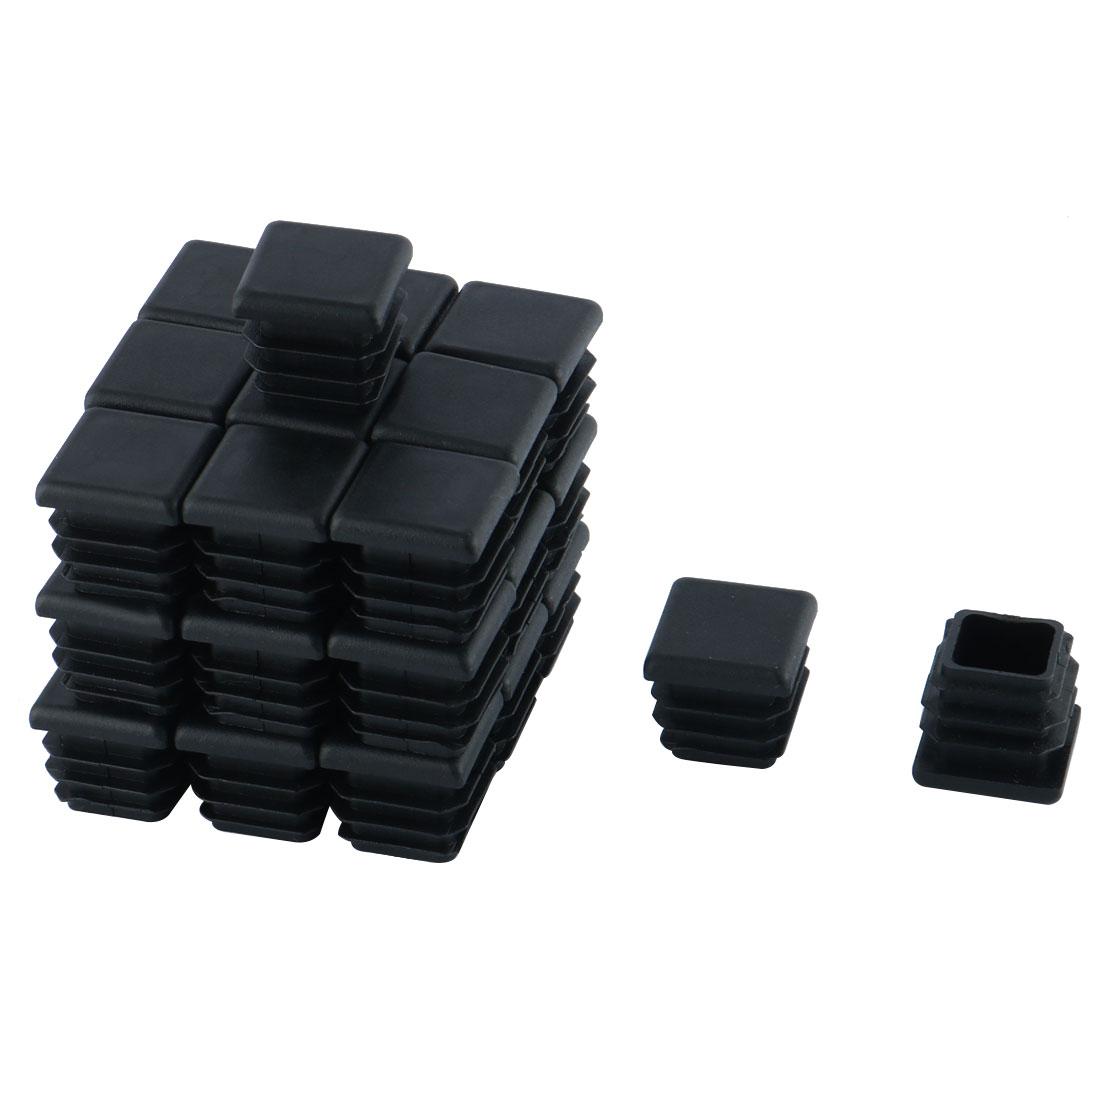 Furniture Chair Table Plastic Square Tube Insert Cap Black 20mm x 20mm 30pcs